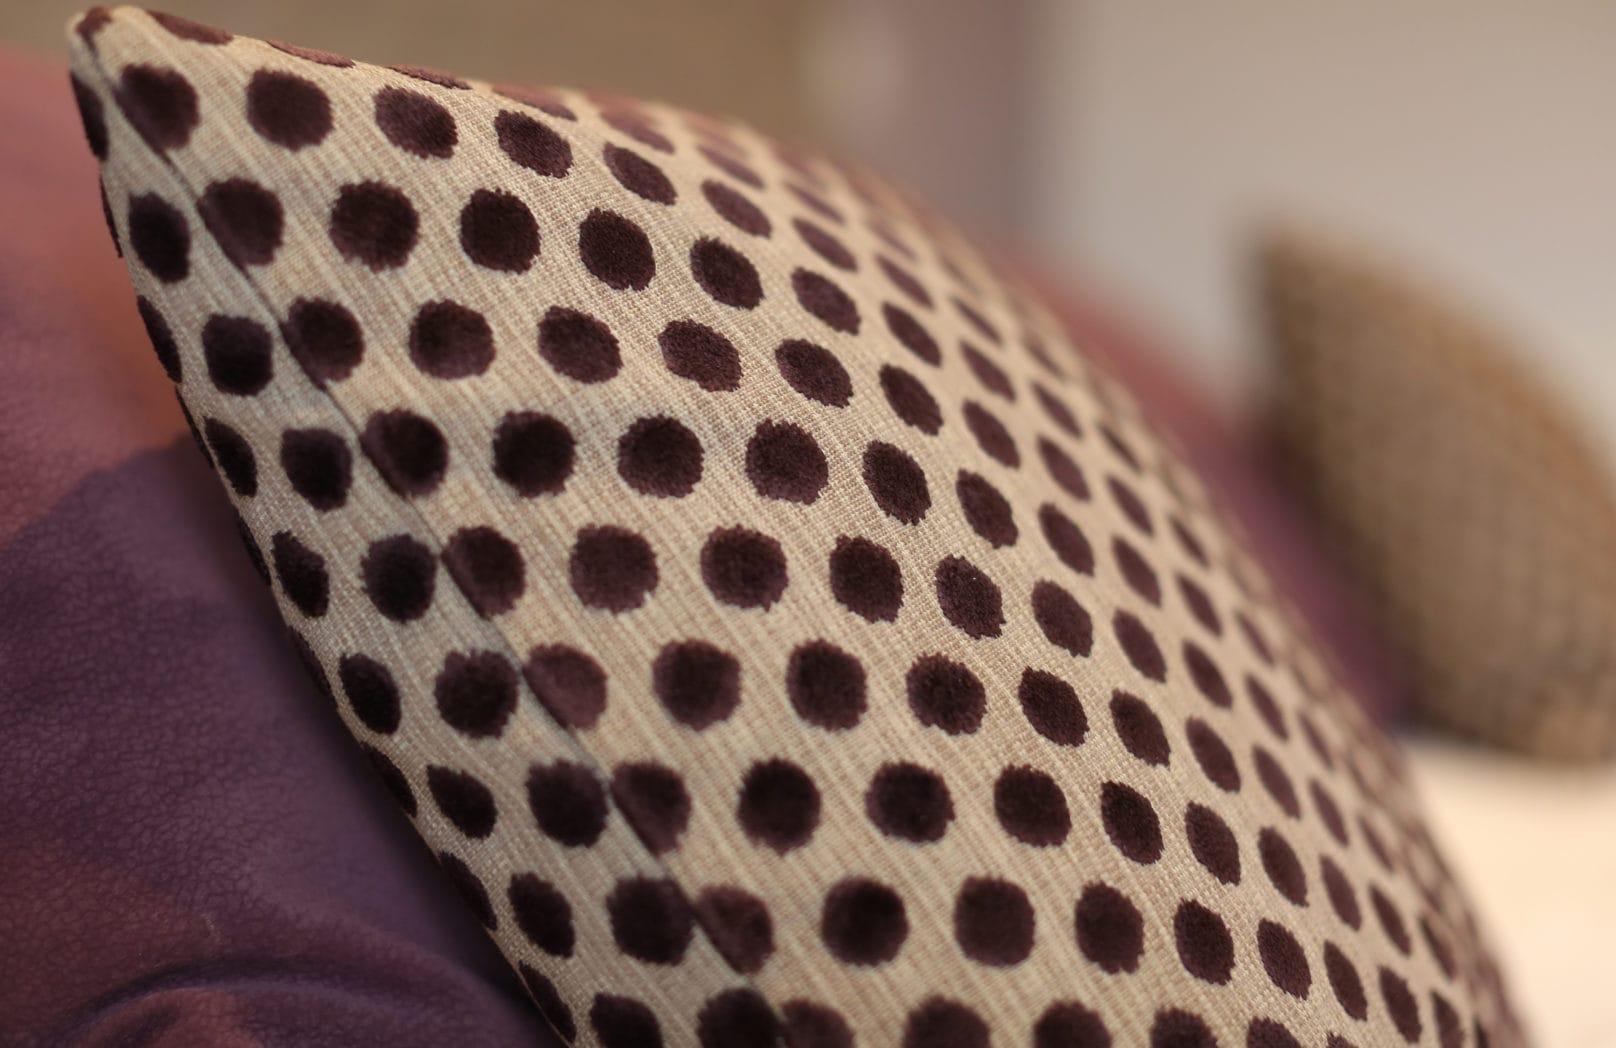 Cushions in hotel bedroom